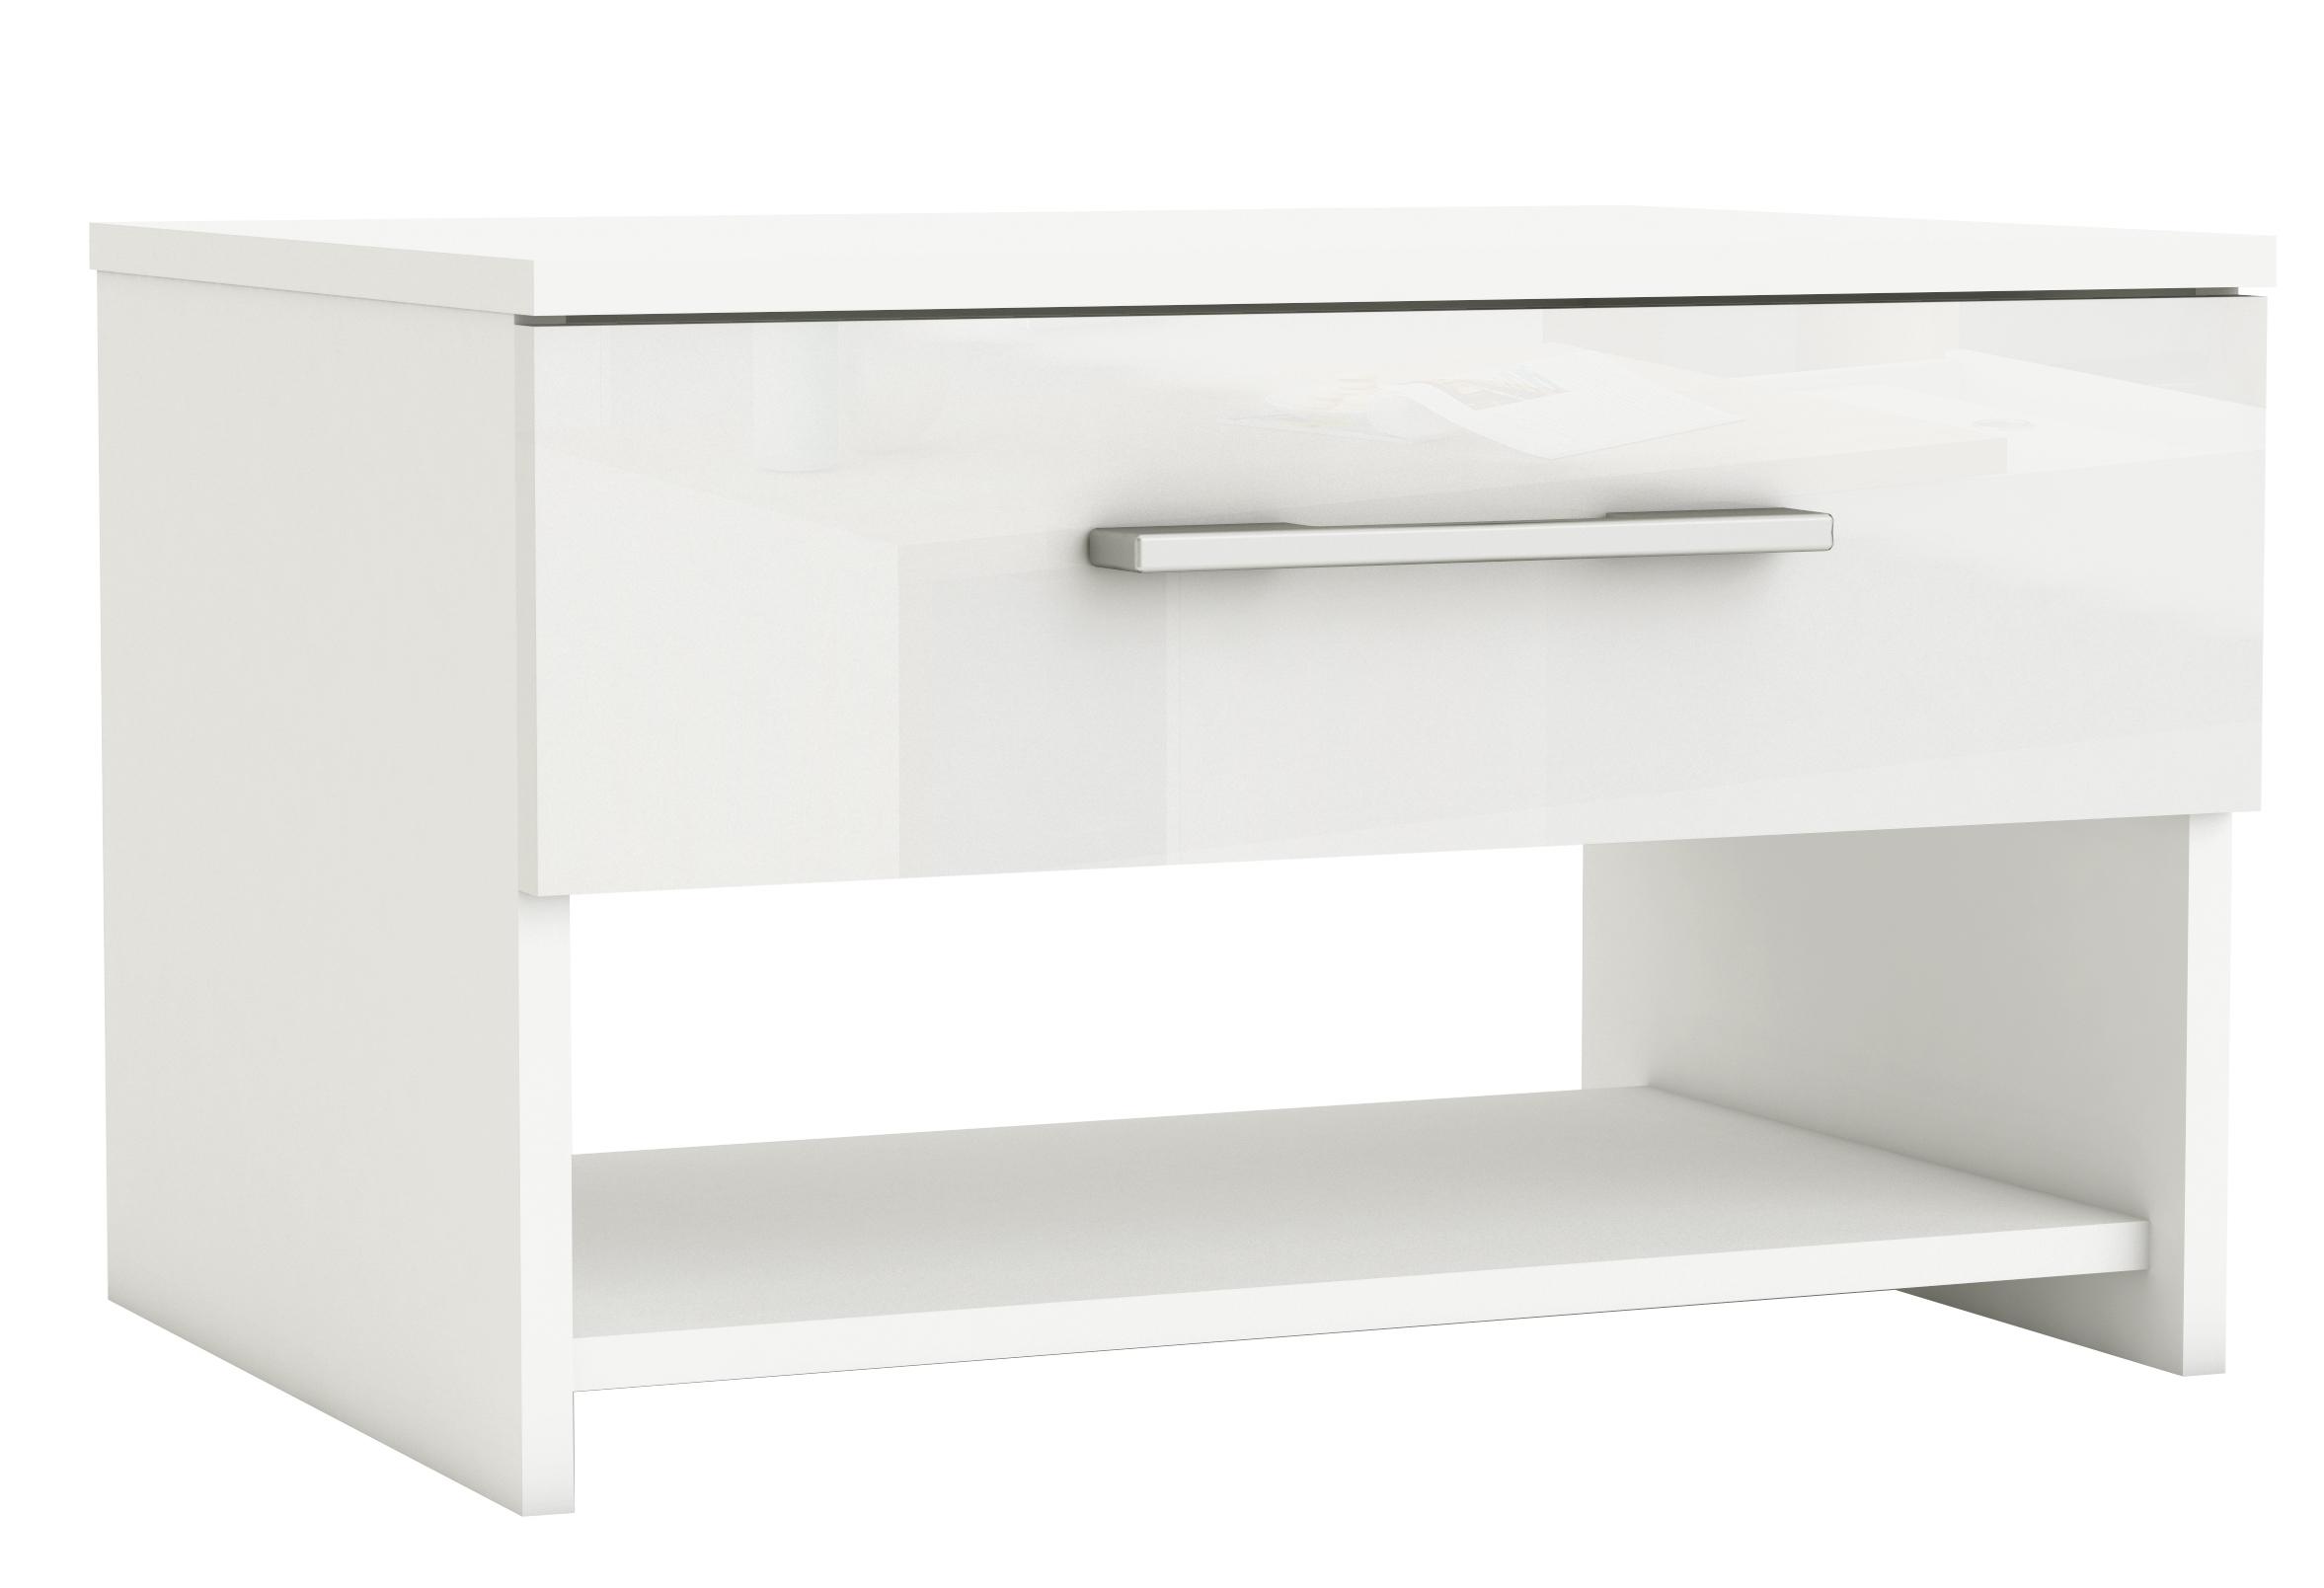 chevet blanc brillant las vegas. Black Bedroom Furniture Sets. Home Design Ideas